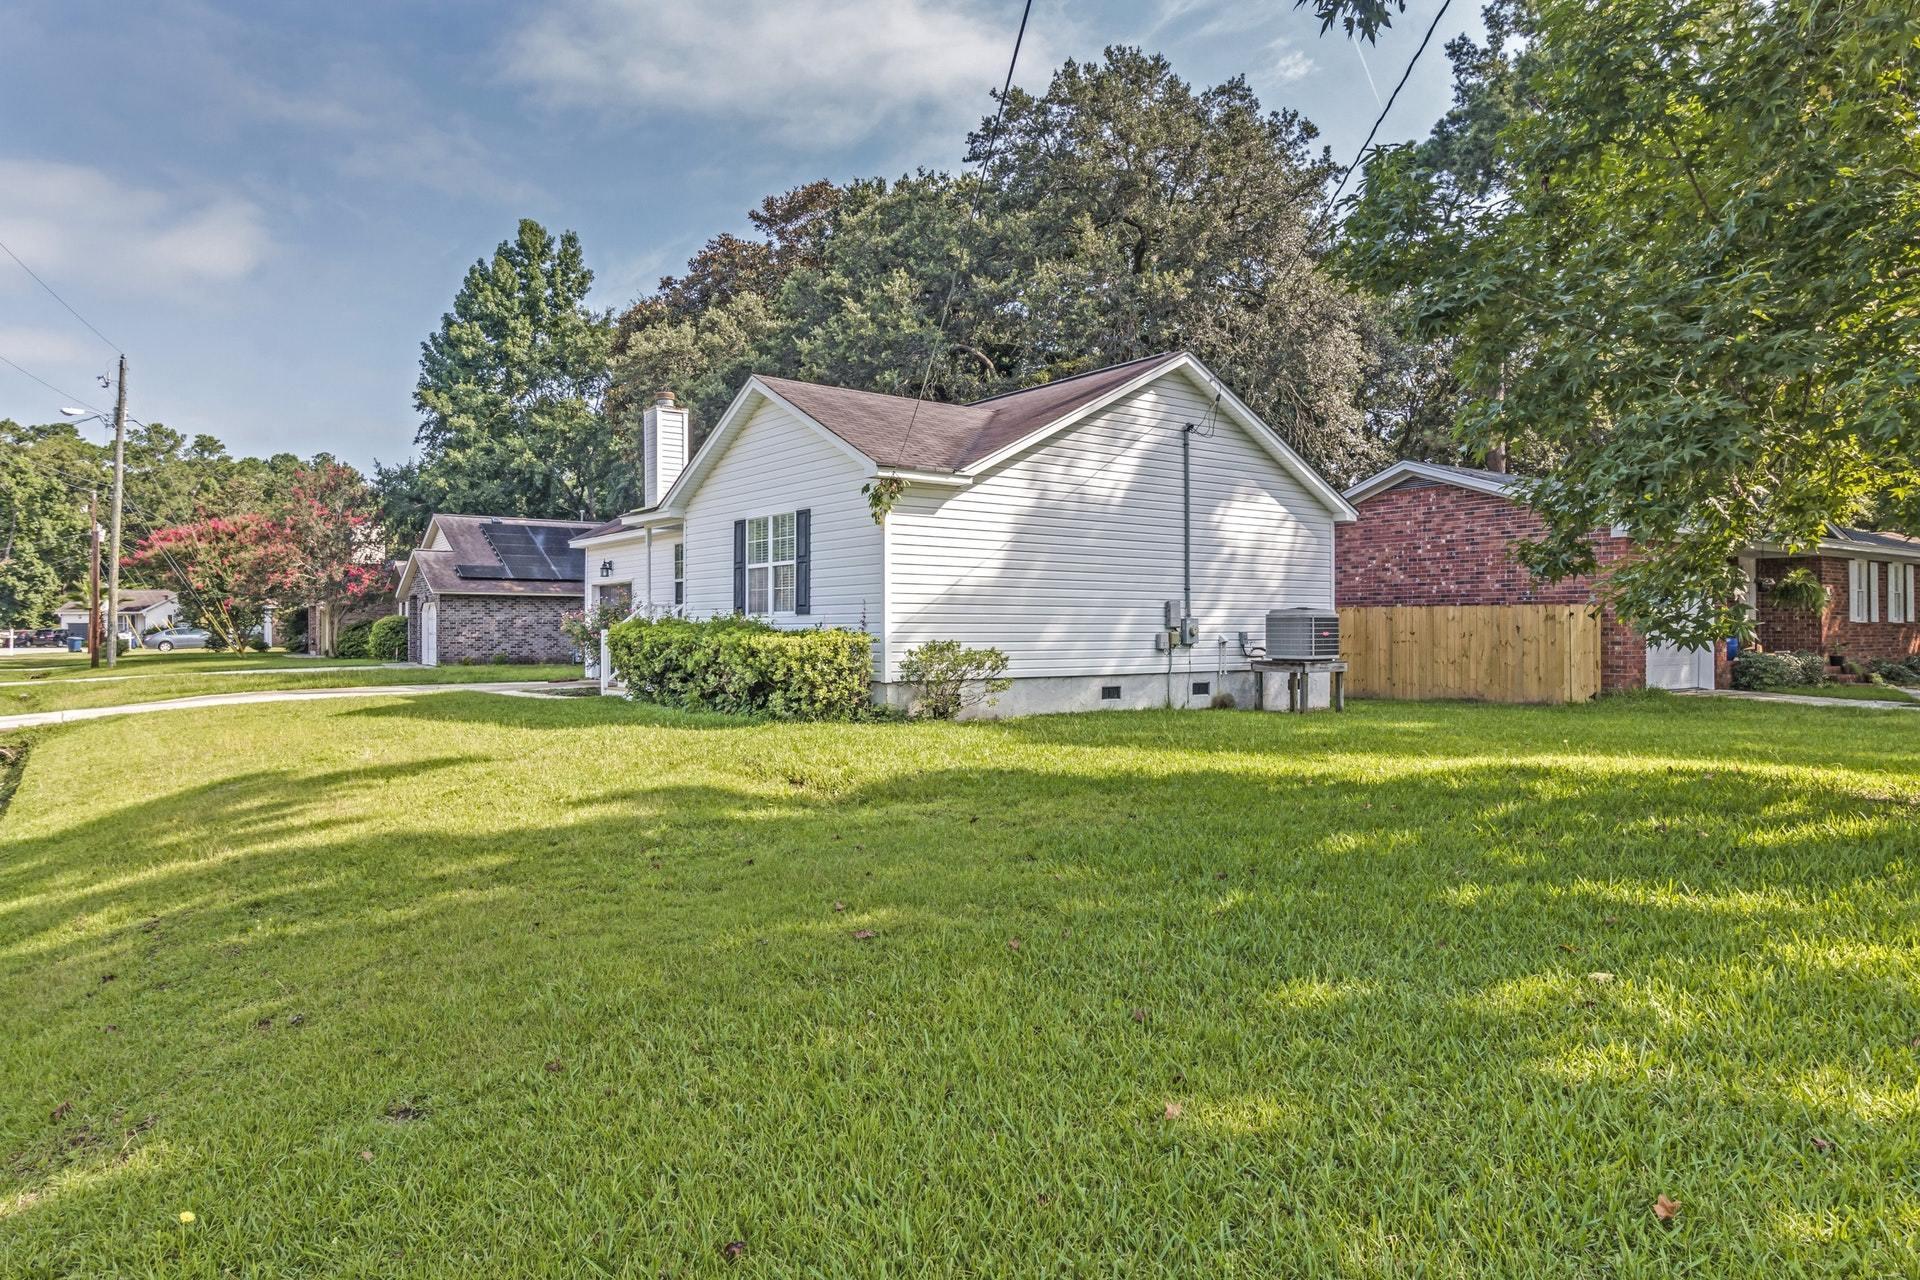 Double Oaks Homes For Sale - 2402 Double Oak, Charleston, SC - 2